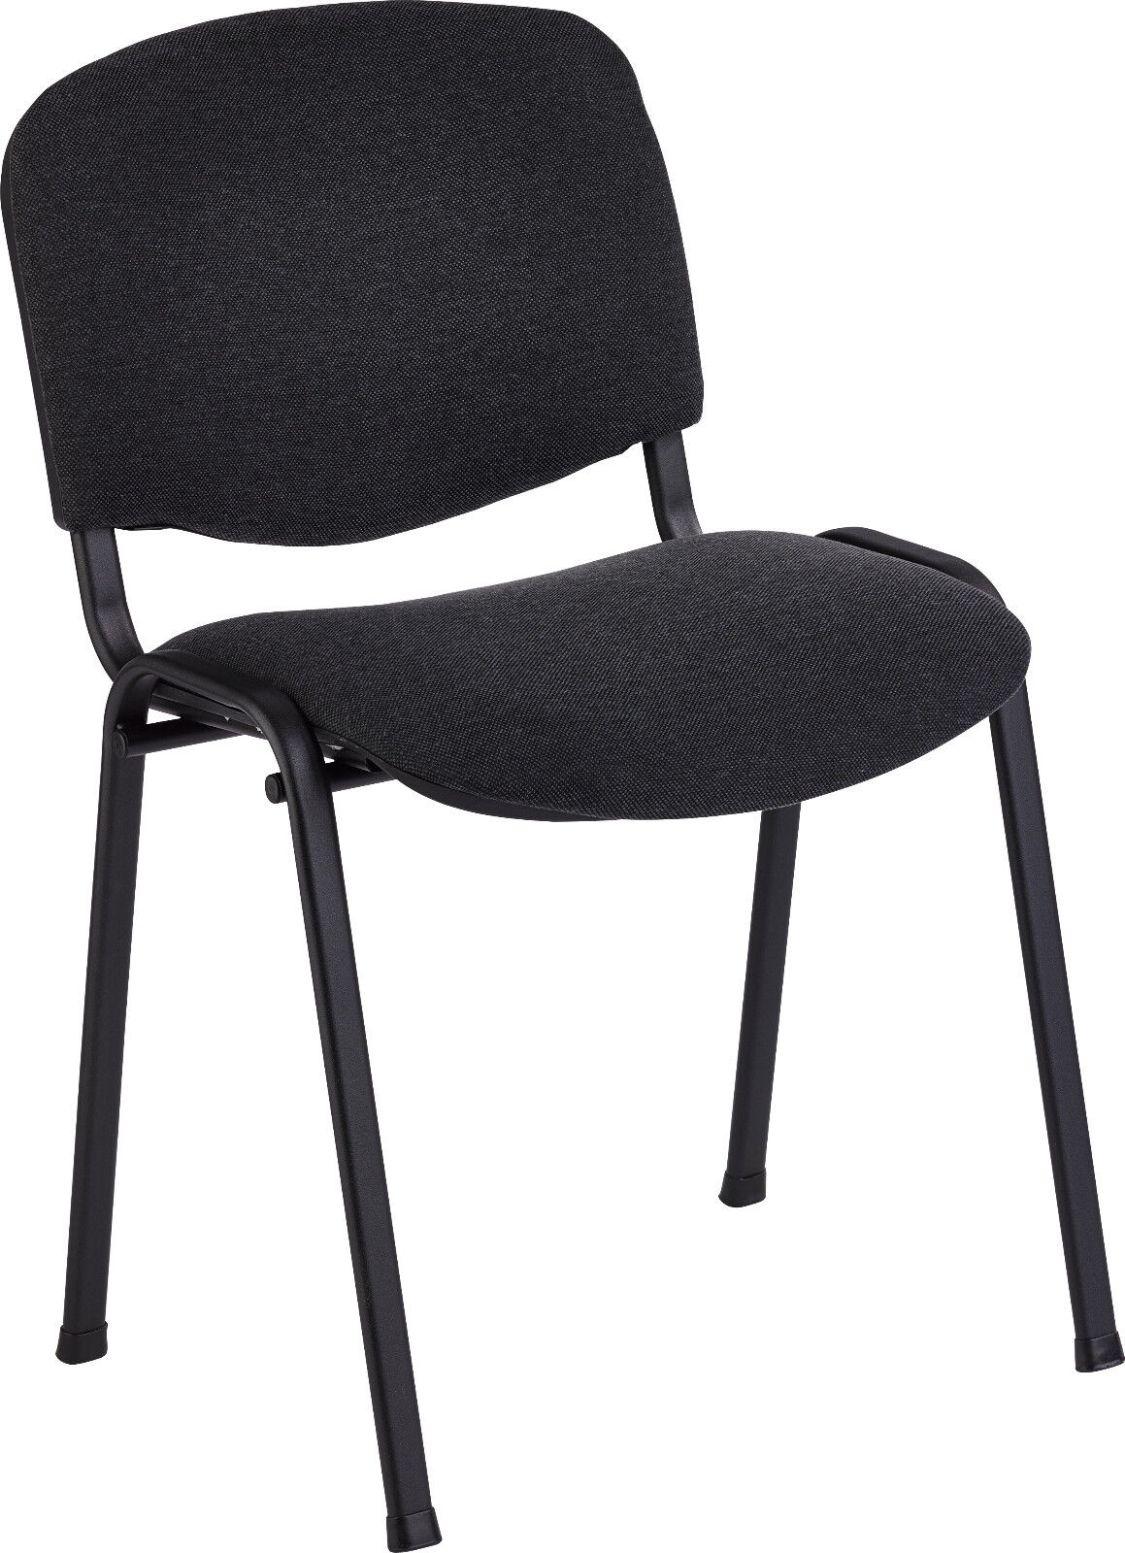 Beethoven Iso - Konferenzstuhl, Bankettstuhl, Stapelstuhl, Besucherstuhl schwarz